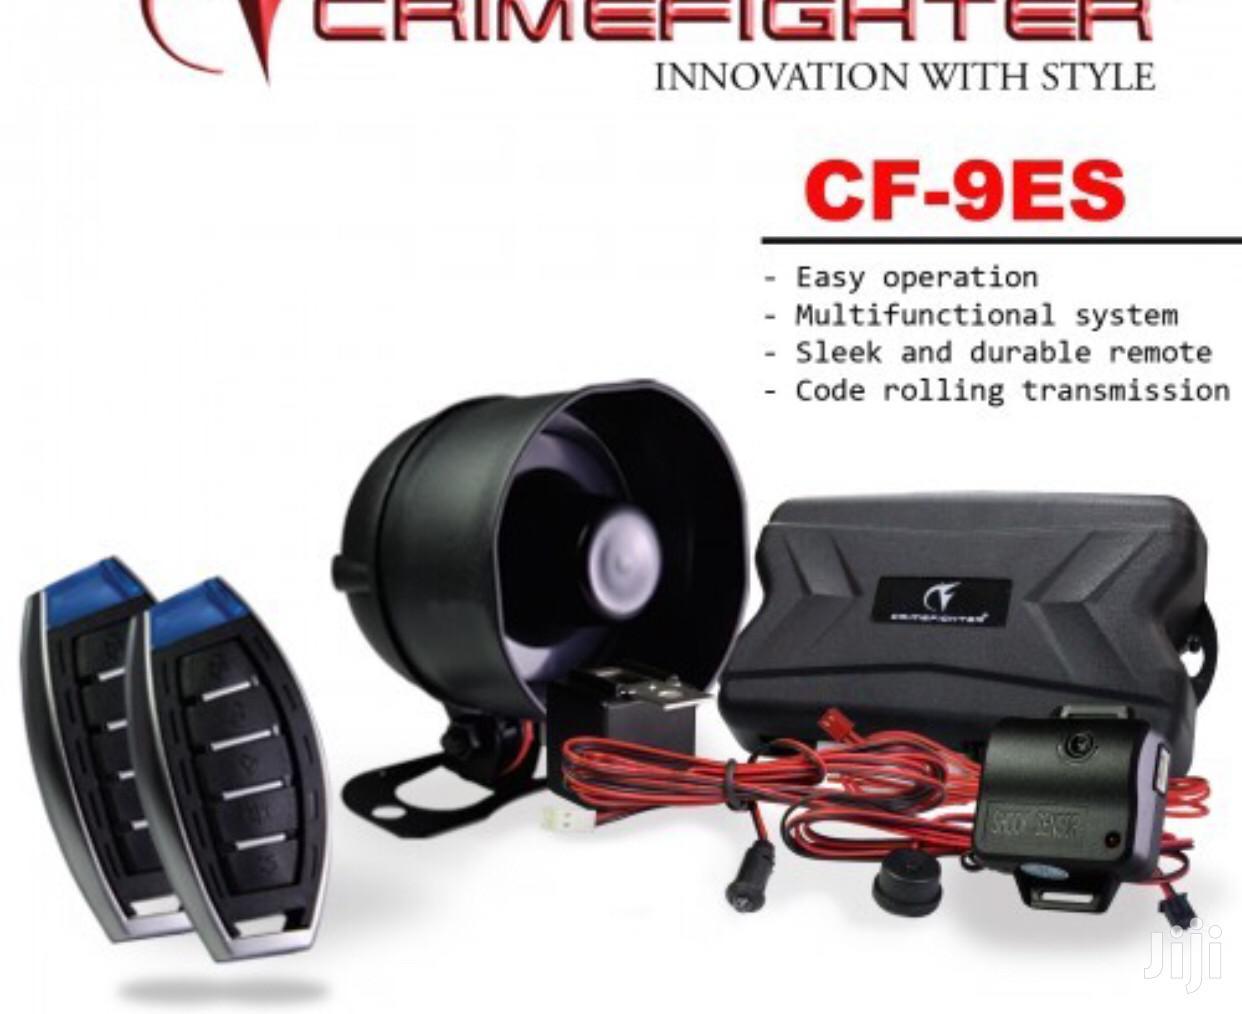 CRIMEFIGHTER CF-9 Remote Keyless Entry 1 Way Car Alarm System